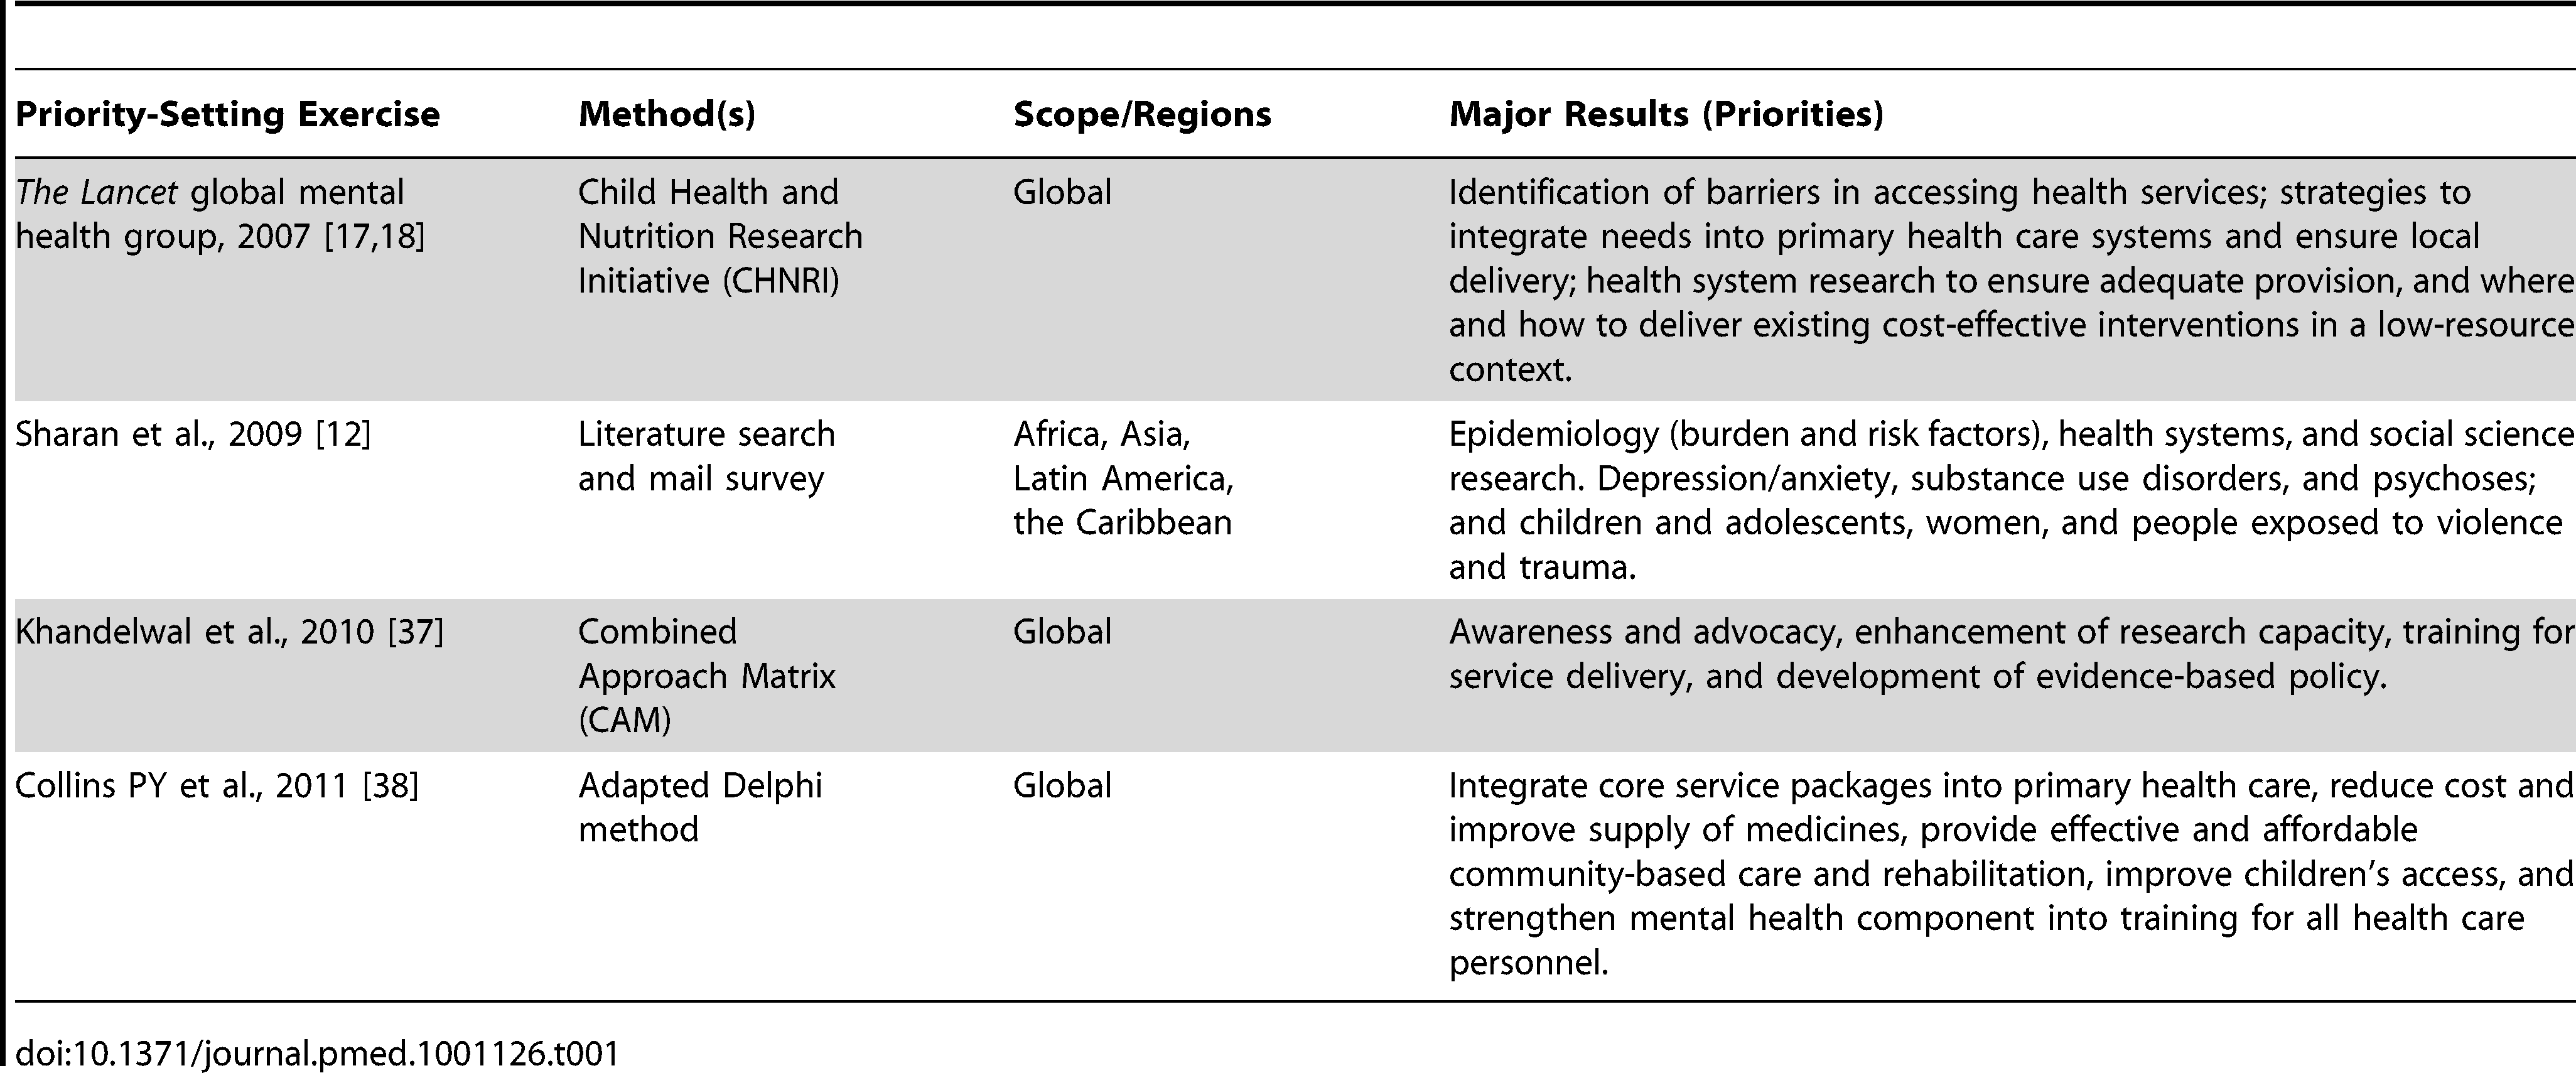 Major global mental health research priority-setting exercises.